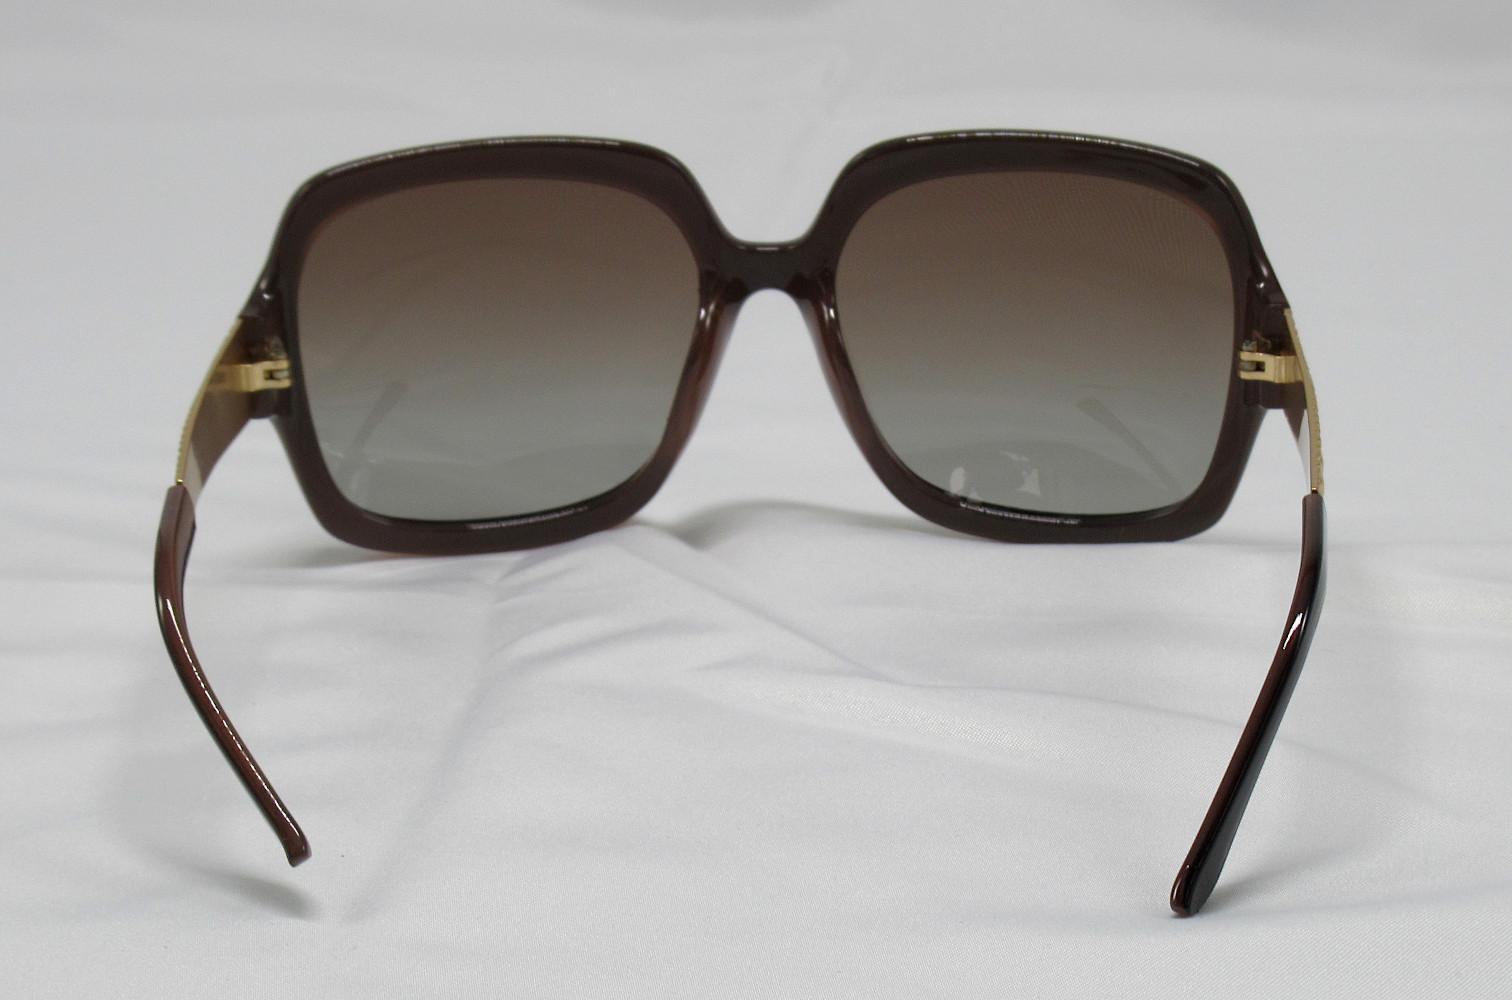 RJ-114_Polarized Sunglasses_brown-gold-P2232-5